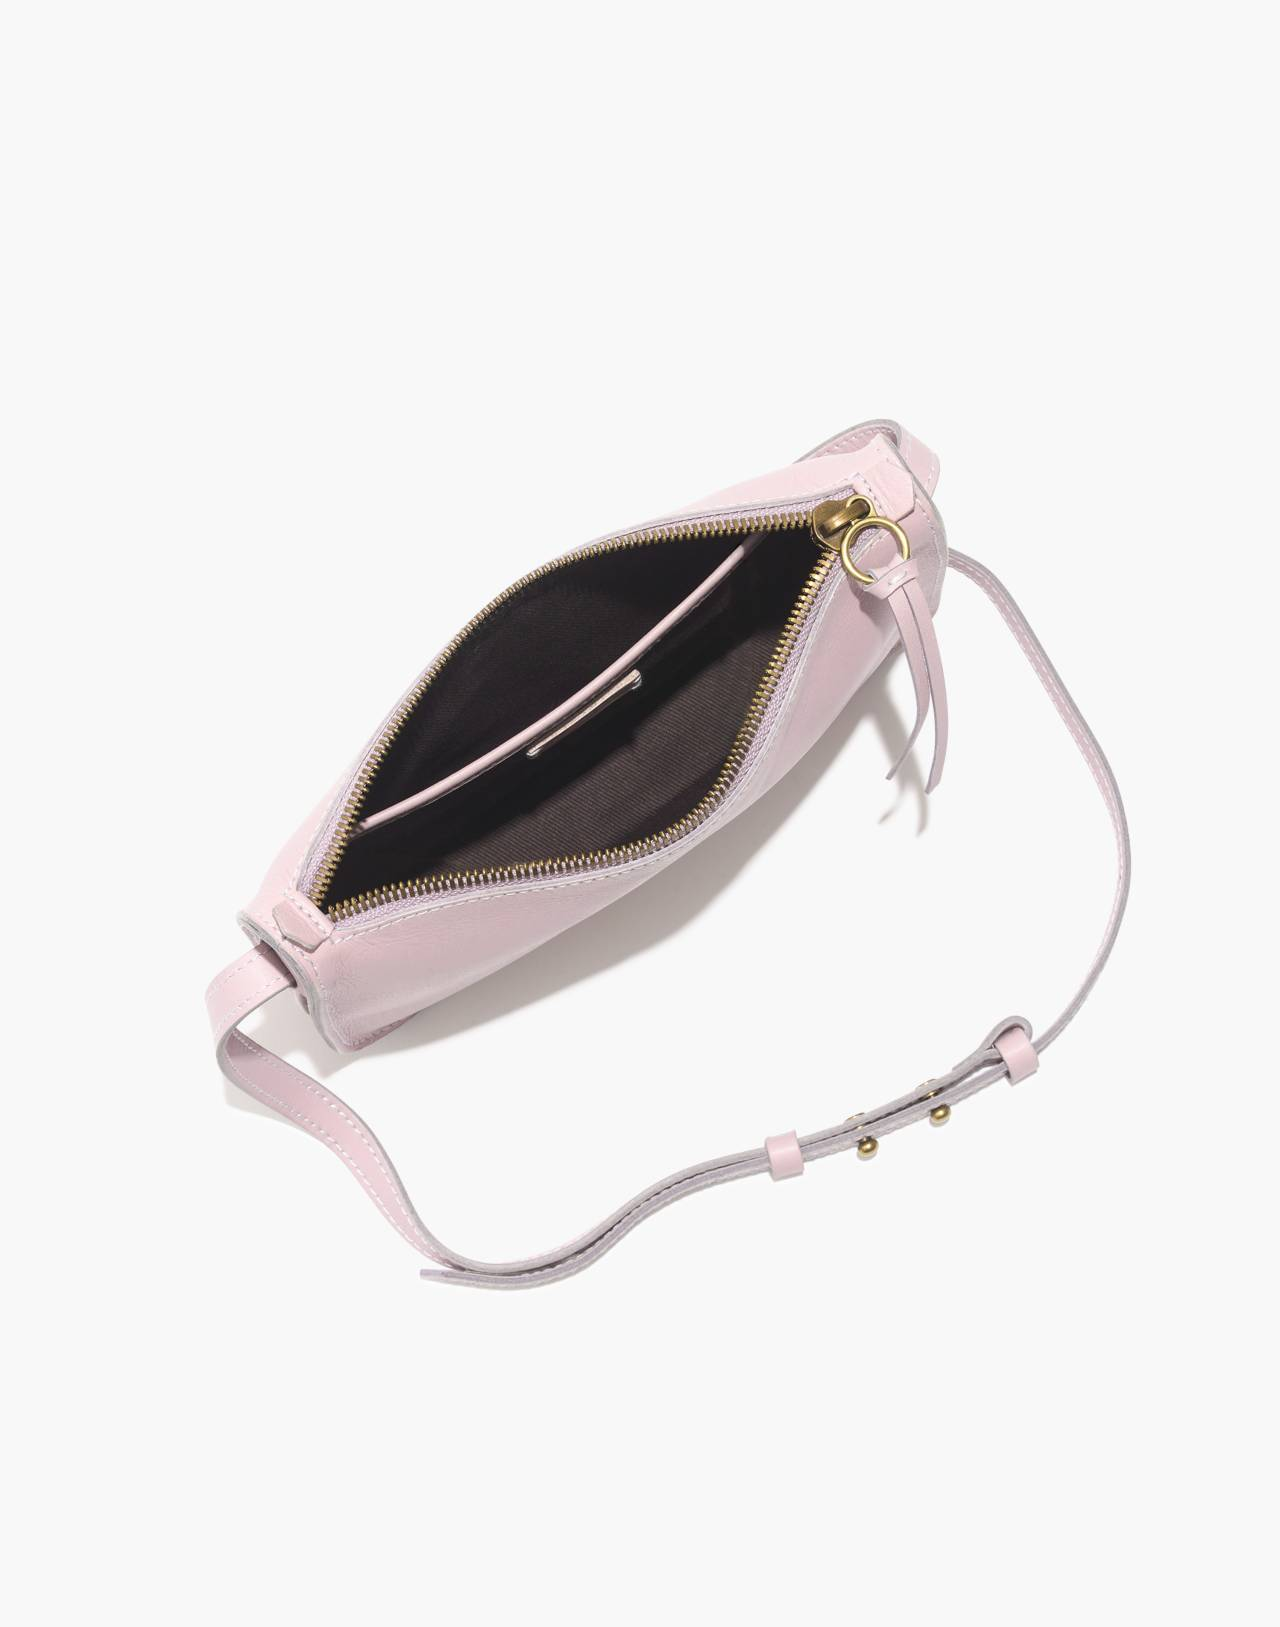 The Simple Crossbody Bag in wisteria dove image 2